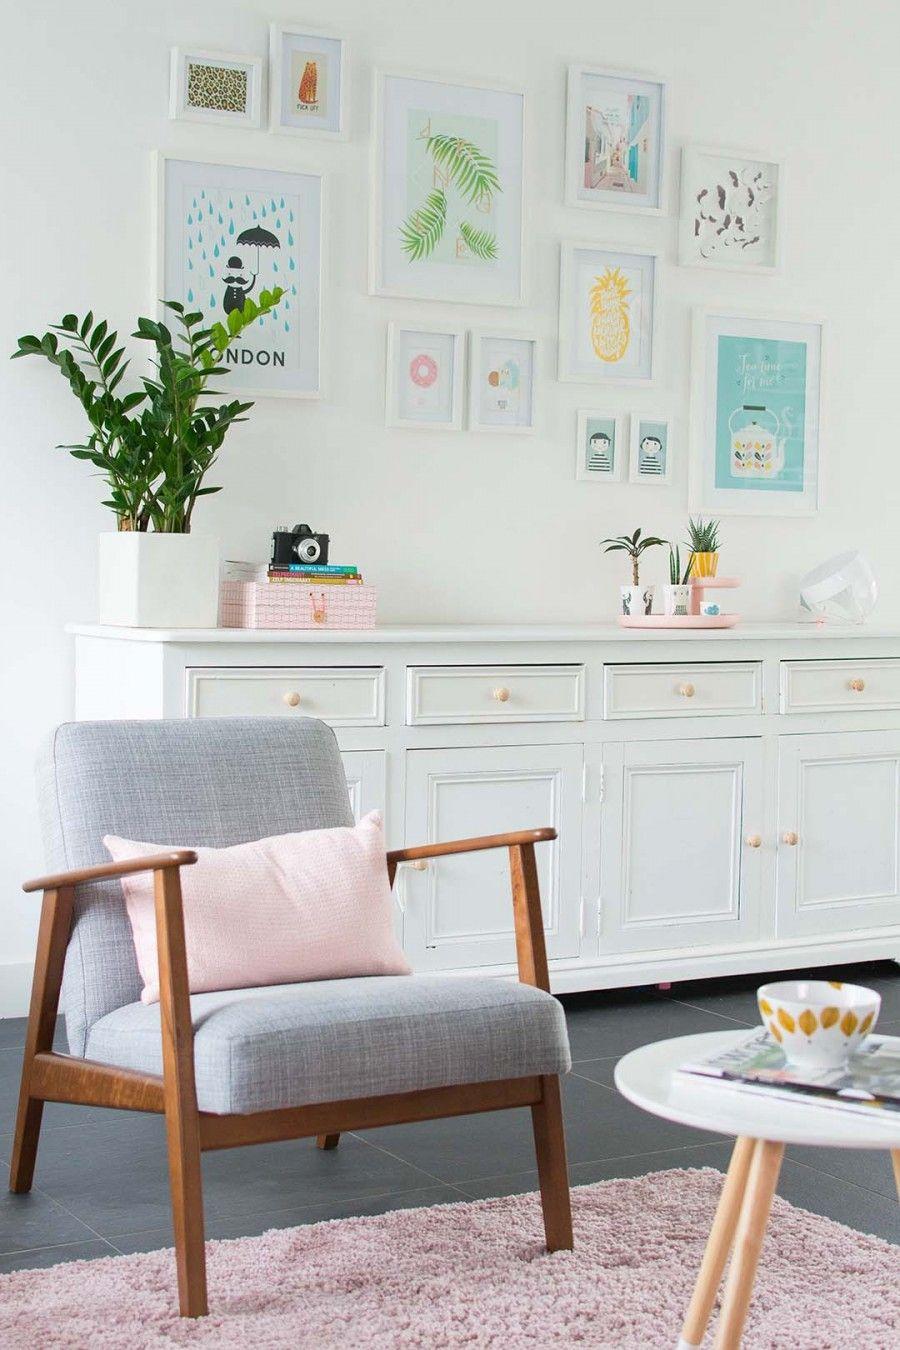 My livingroom - EKENÄSET IKEA chair - | f u r n i t u r e ...